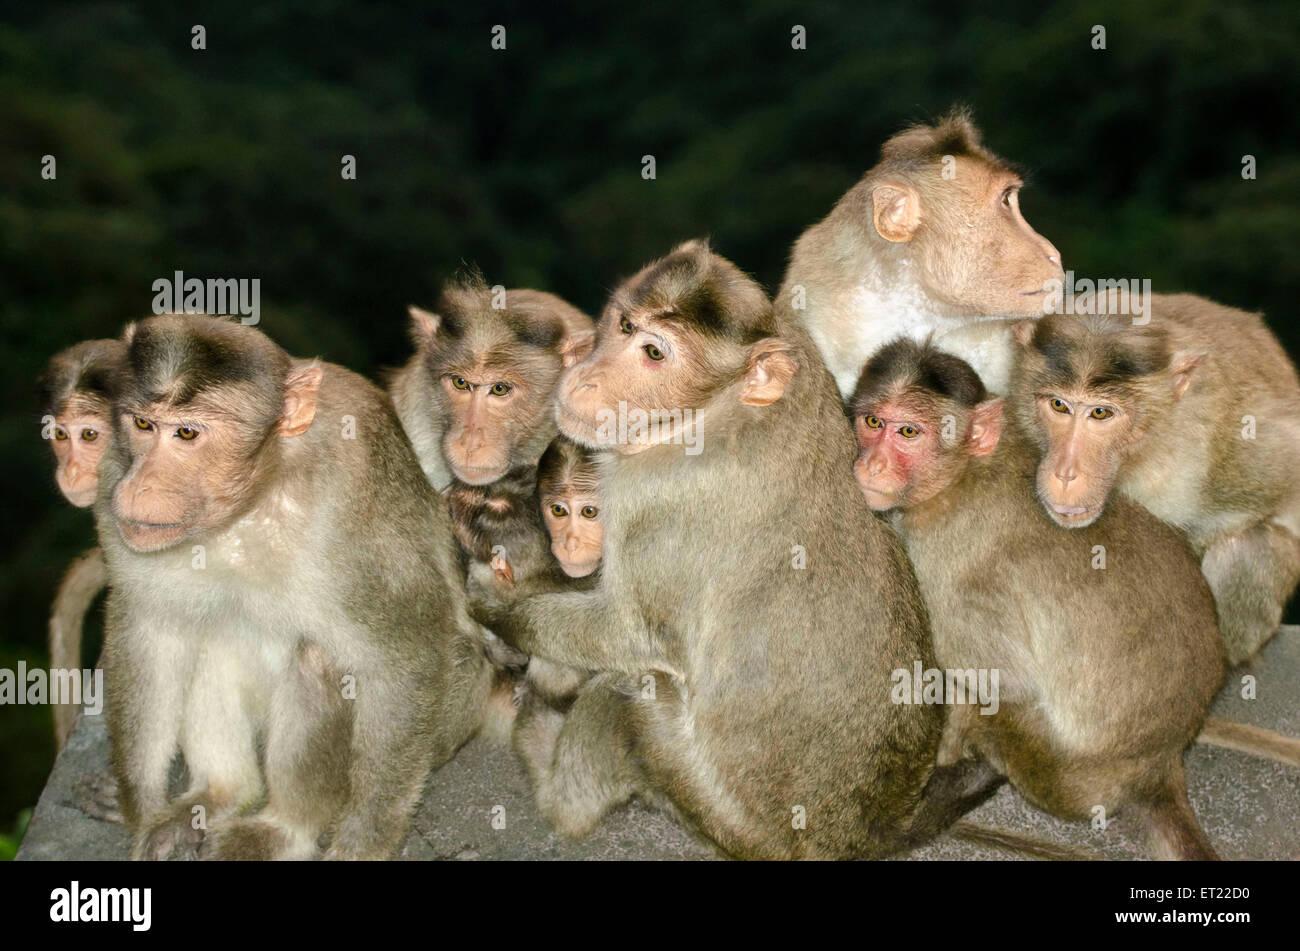 Bonnet macaques Macaca radiata Kolhapur Maharashtra India Asia - Stock Image